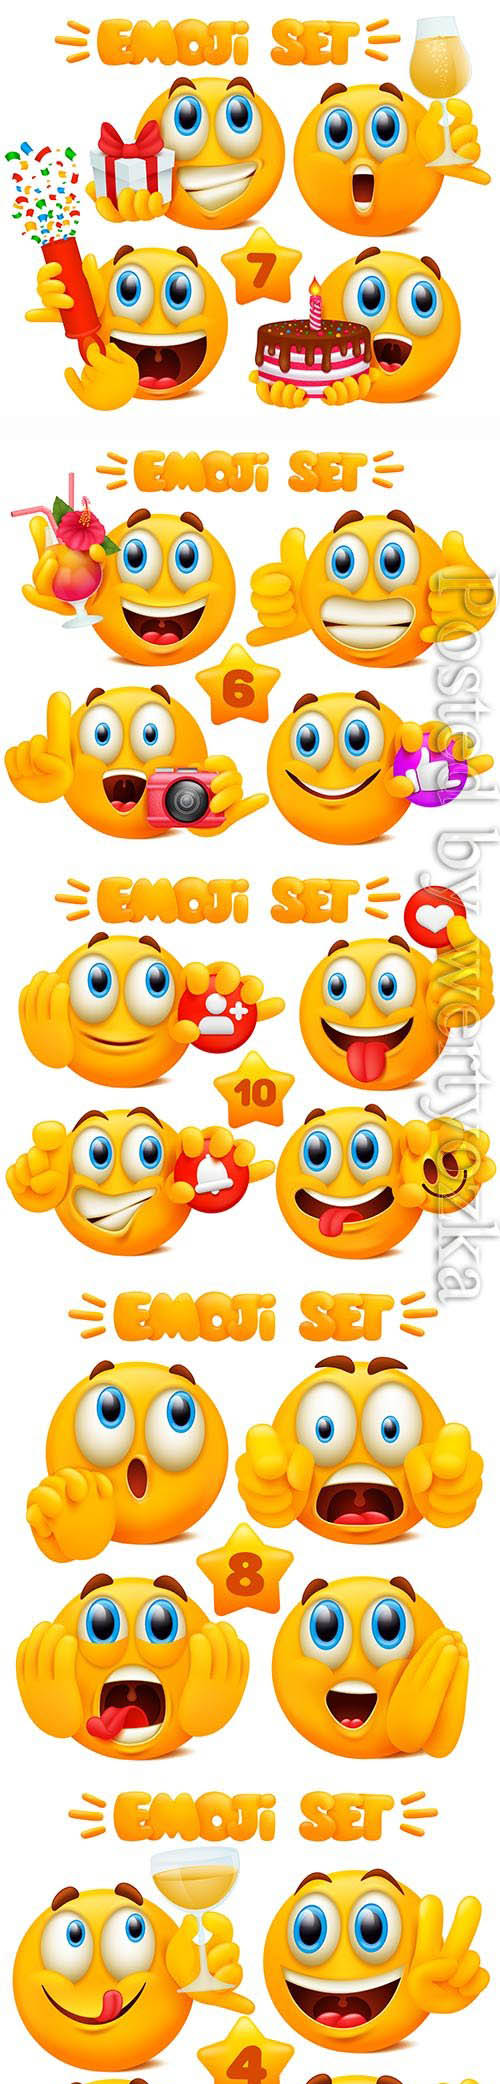 Yellow emoji cartoon characters in glossy 3d